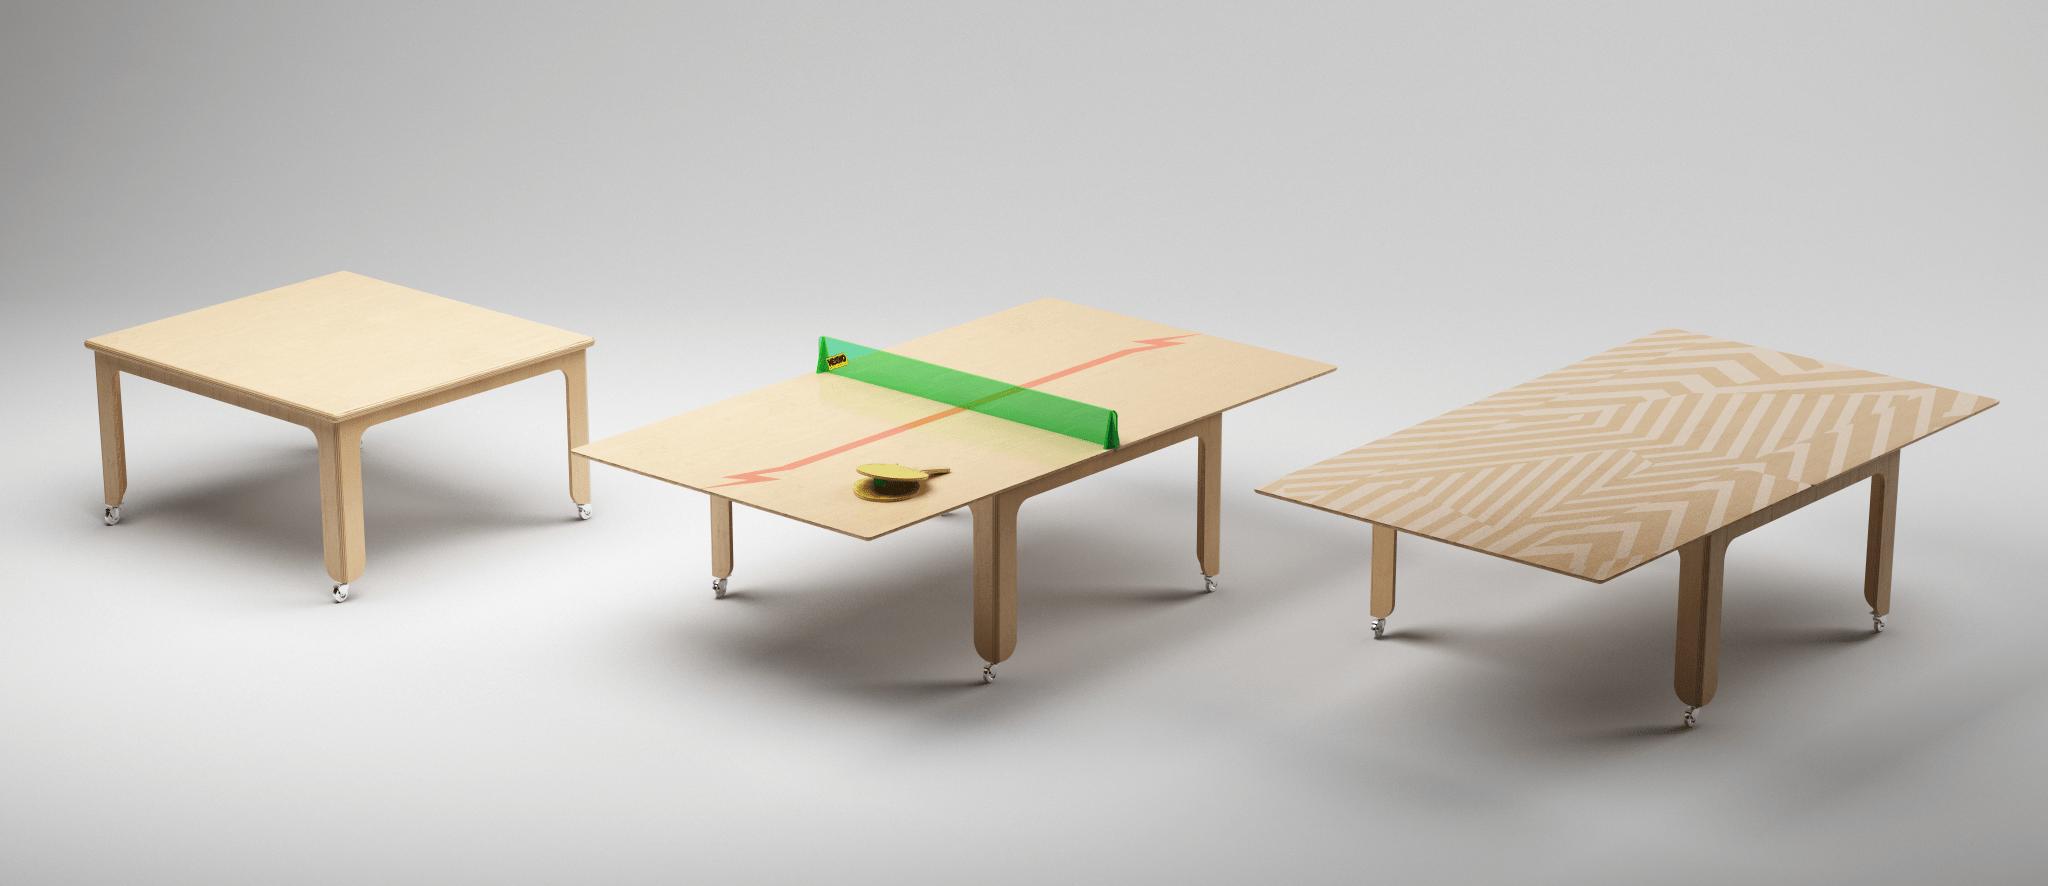 folding table mesa plegable, tavolo pieghevole